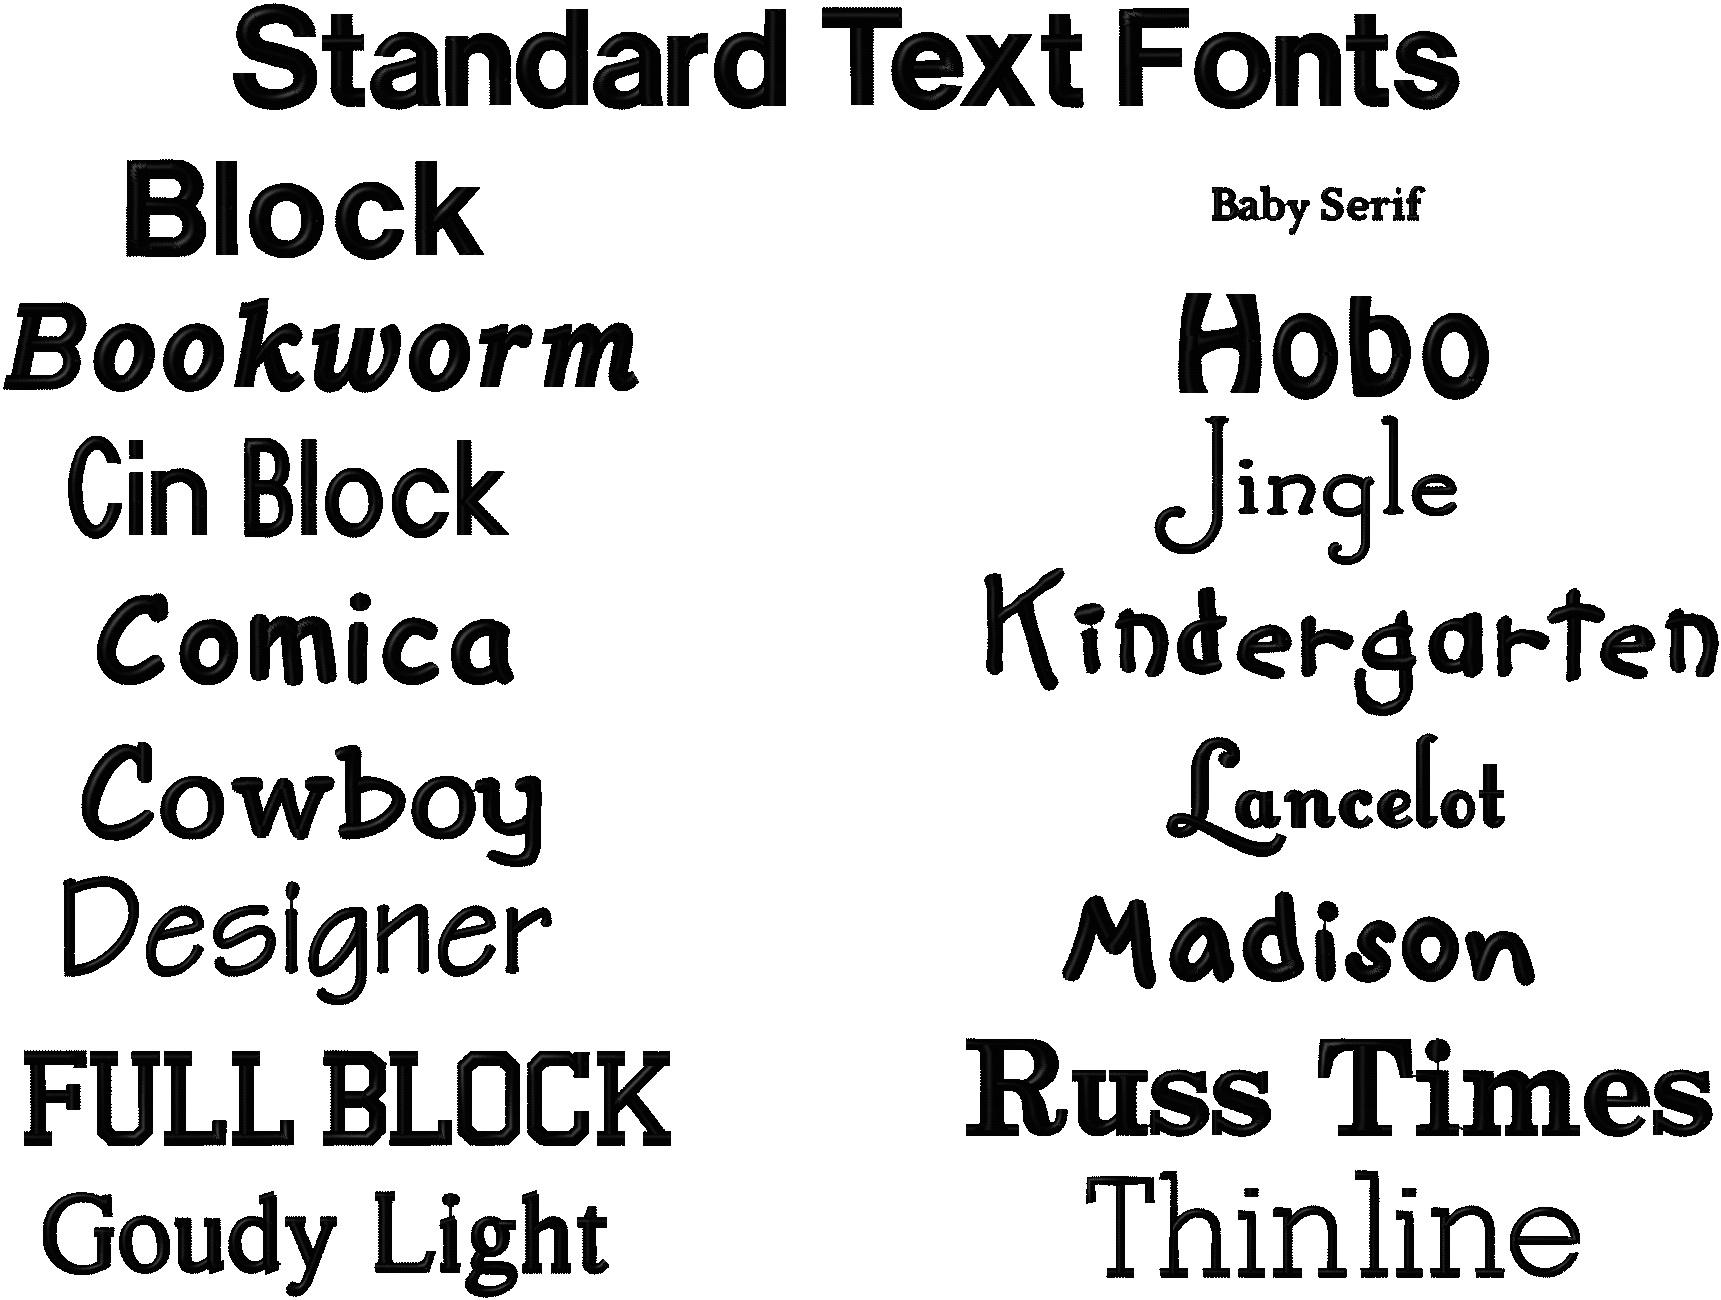 Board+-+Standard+Text+Fonts+February+2016_POF.jpg